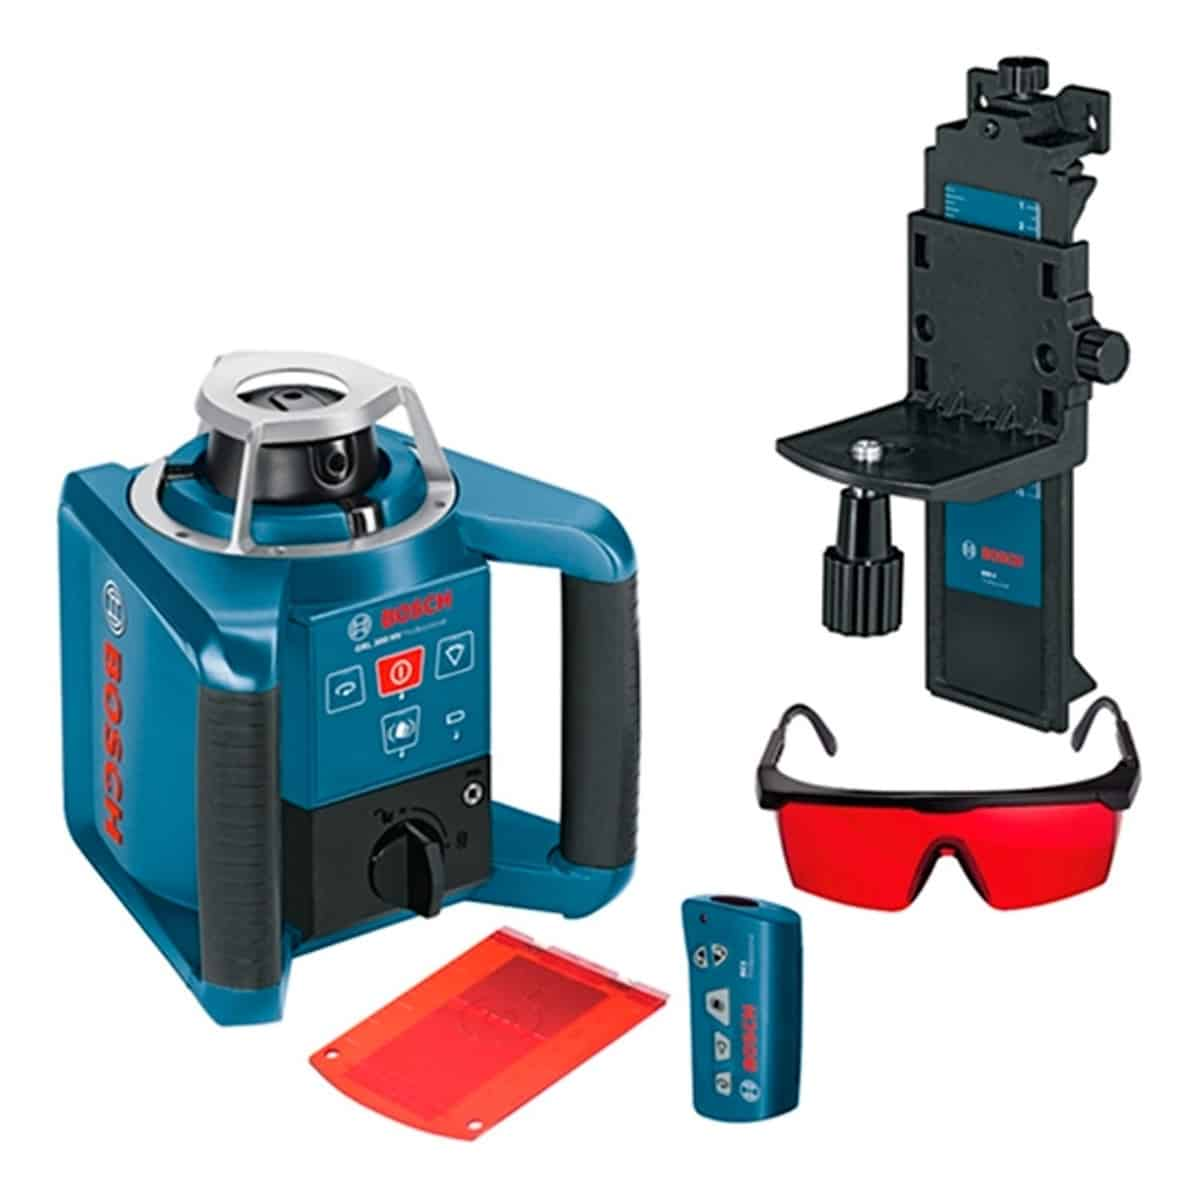 Laser rotativo GRL 300 HV Professional - Foto 2